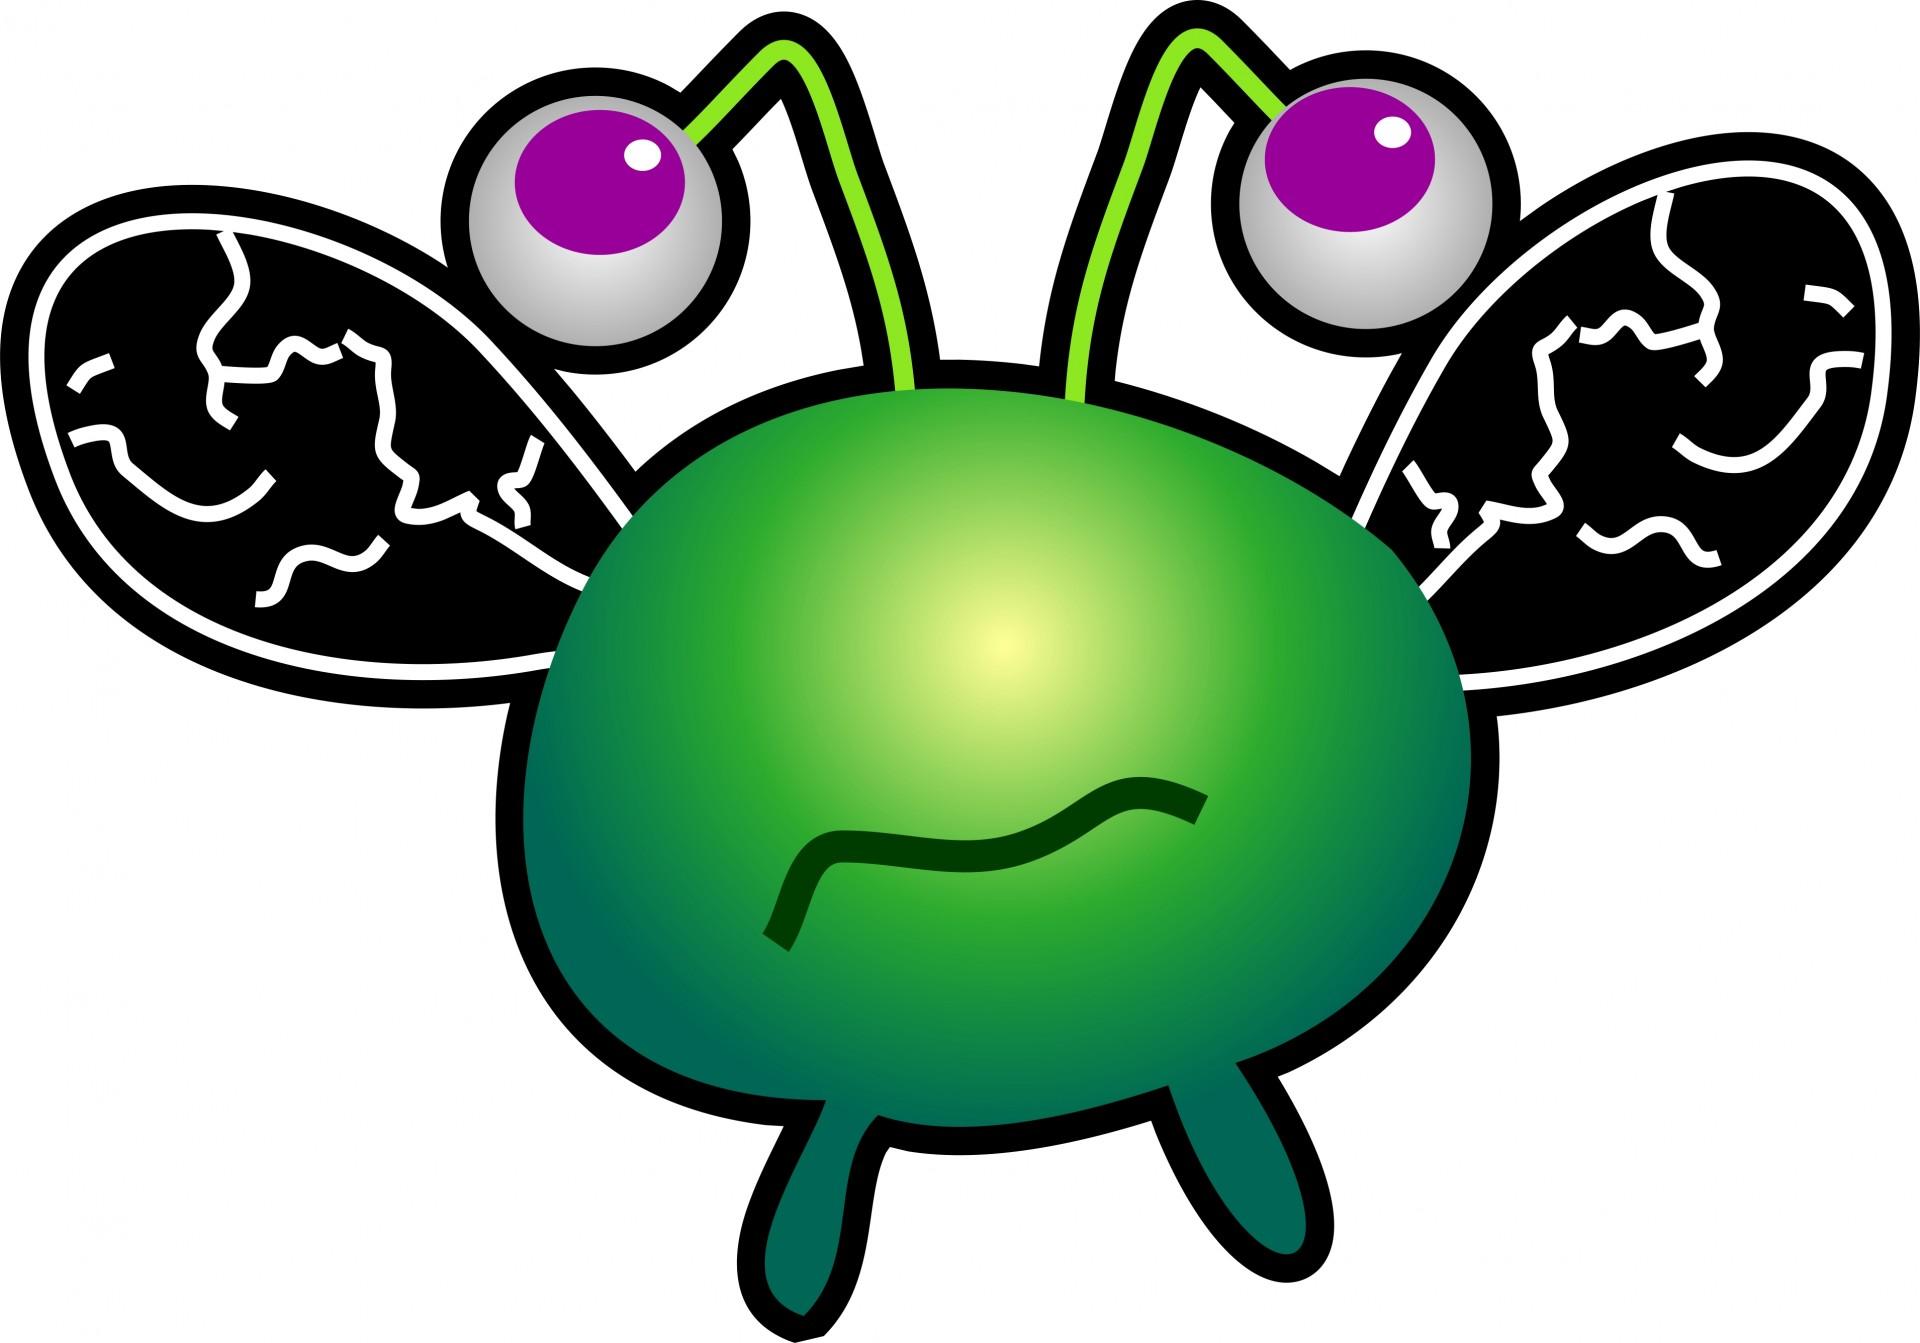 Germ clipart sad. Illustration clip nbsp art